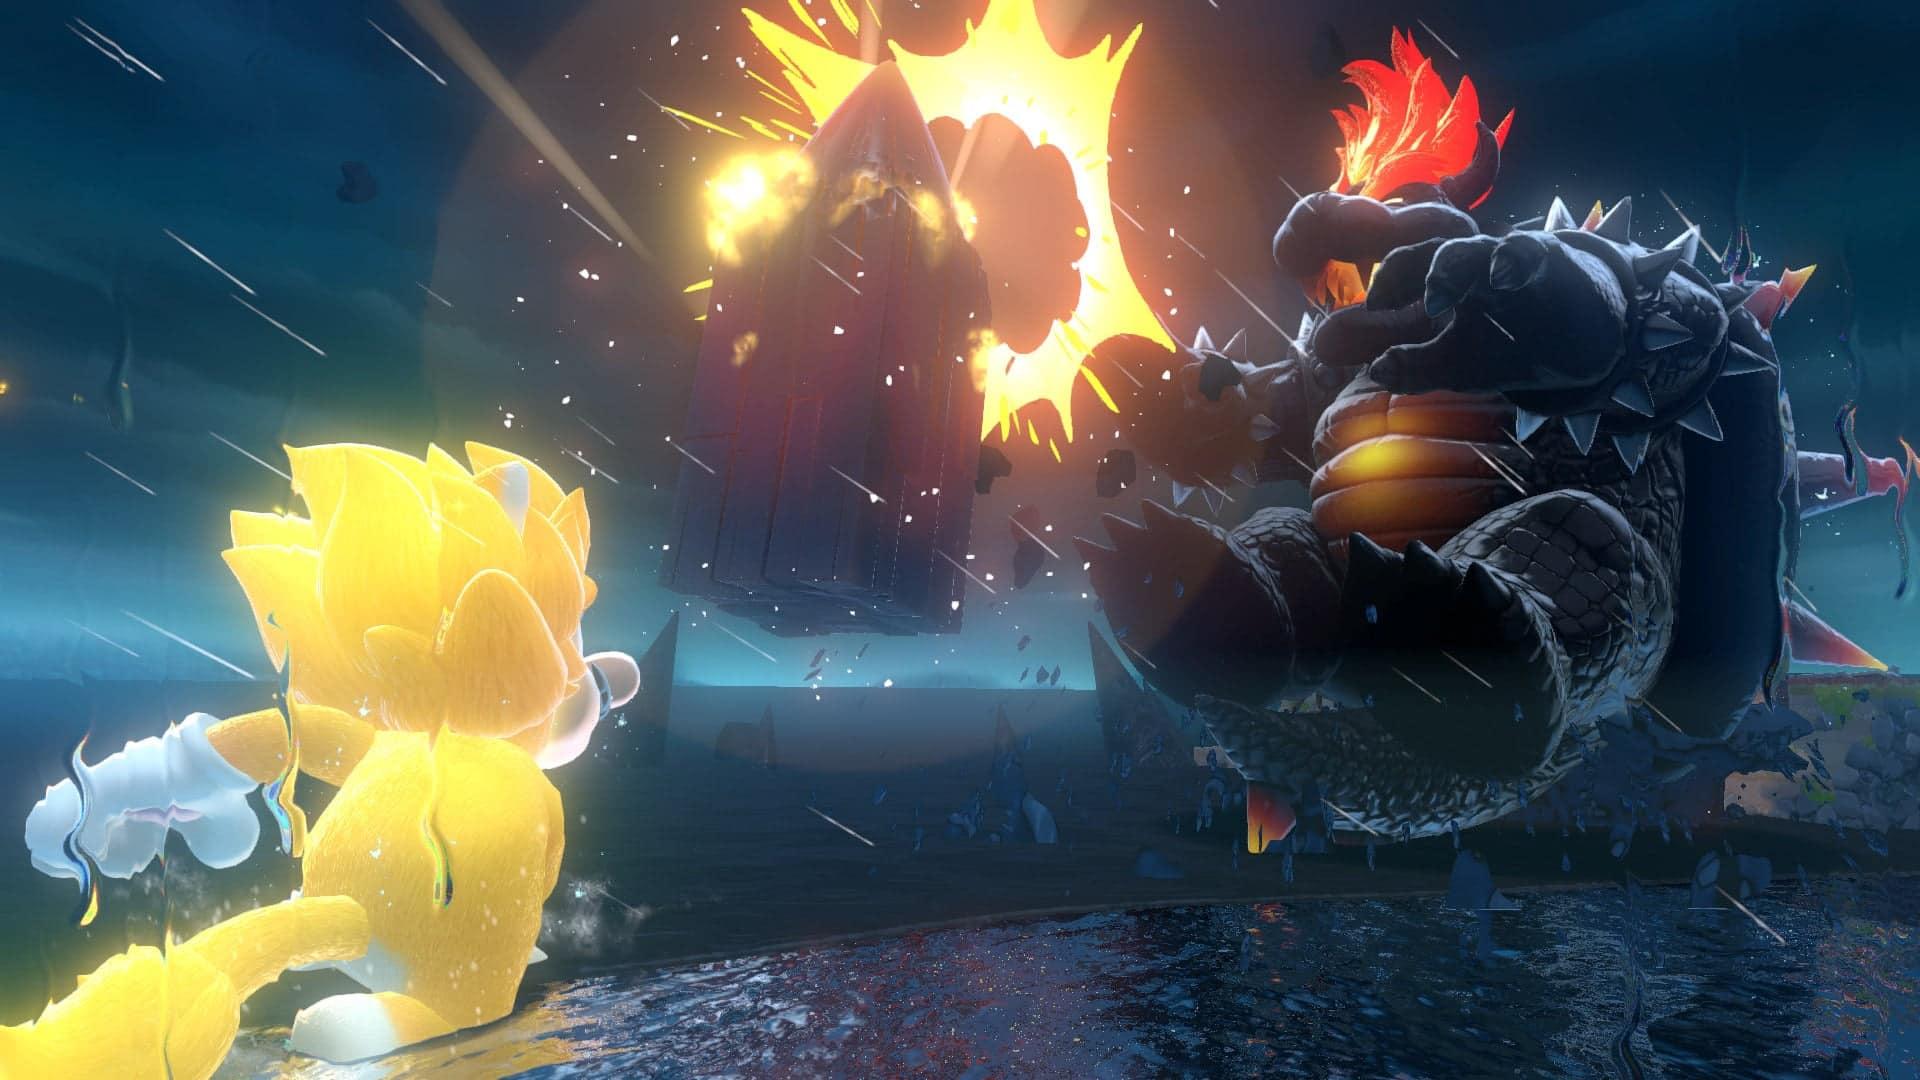 Nintendo fixes Super Mario Odyssey mistake failing with Super Mario 3D World + Bowser's Fury